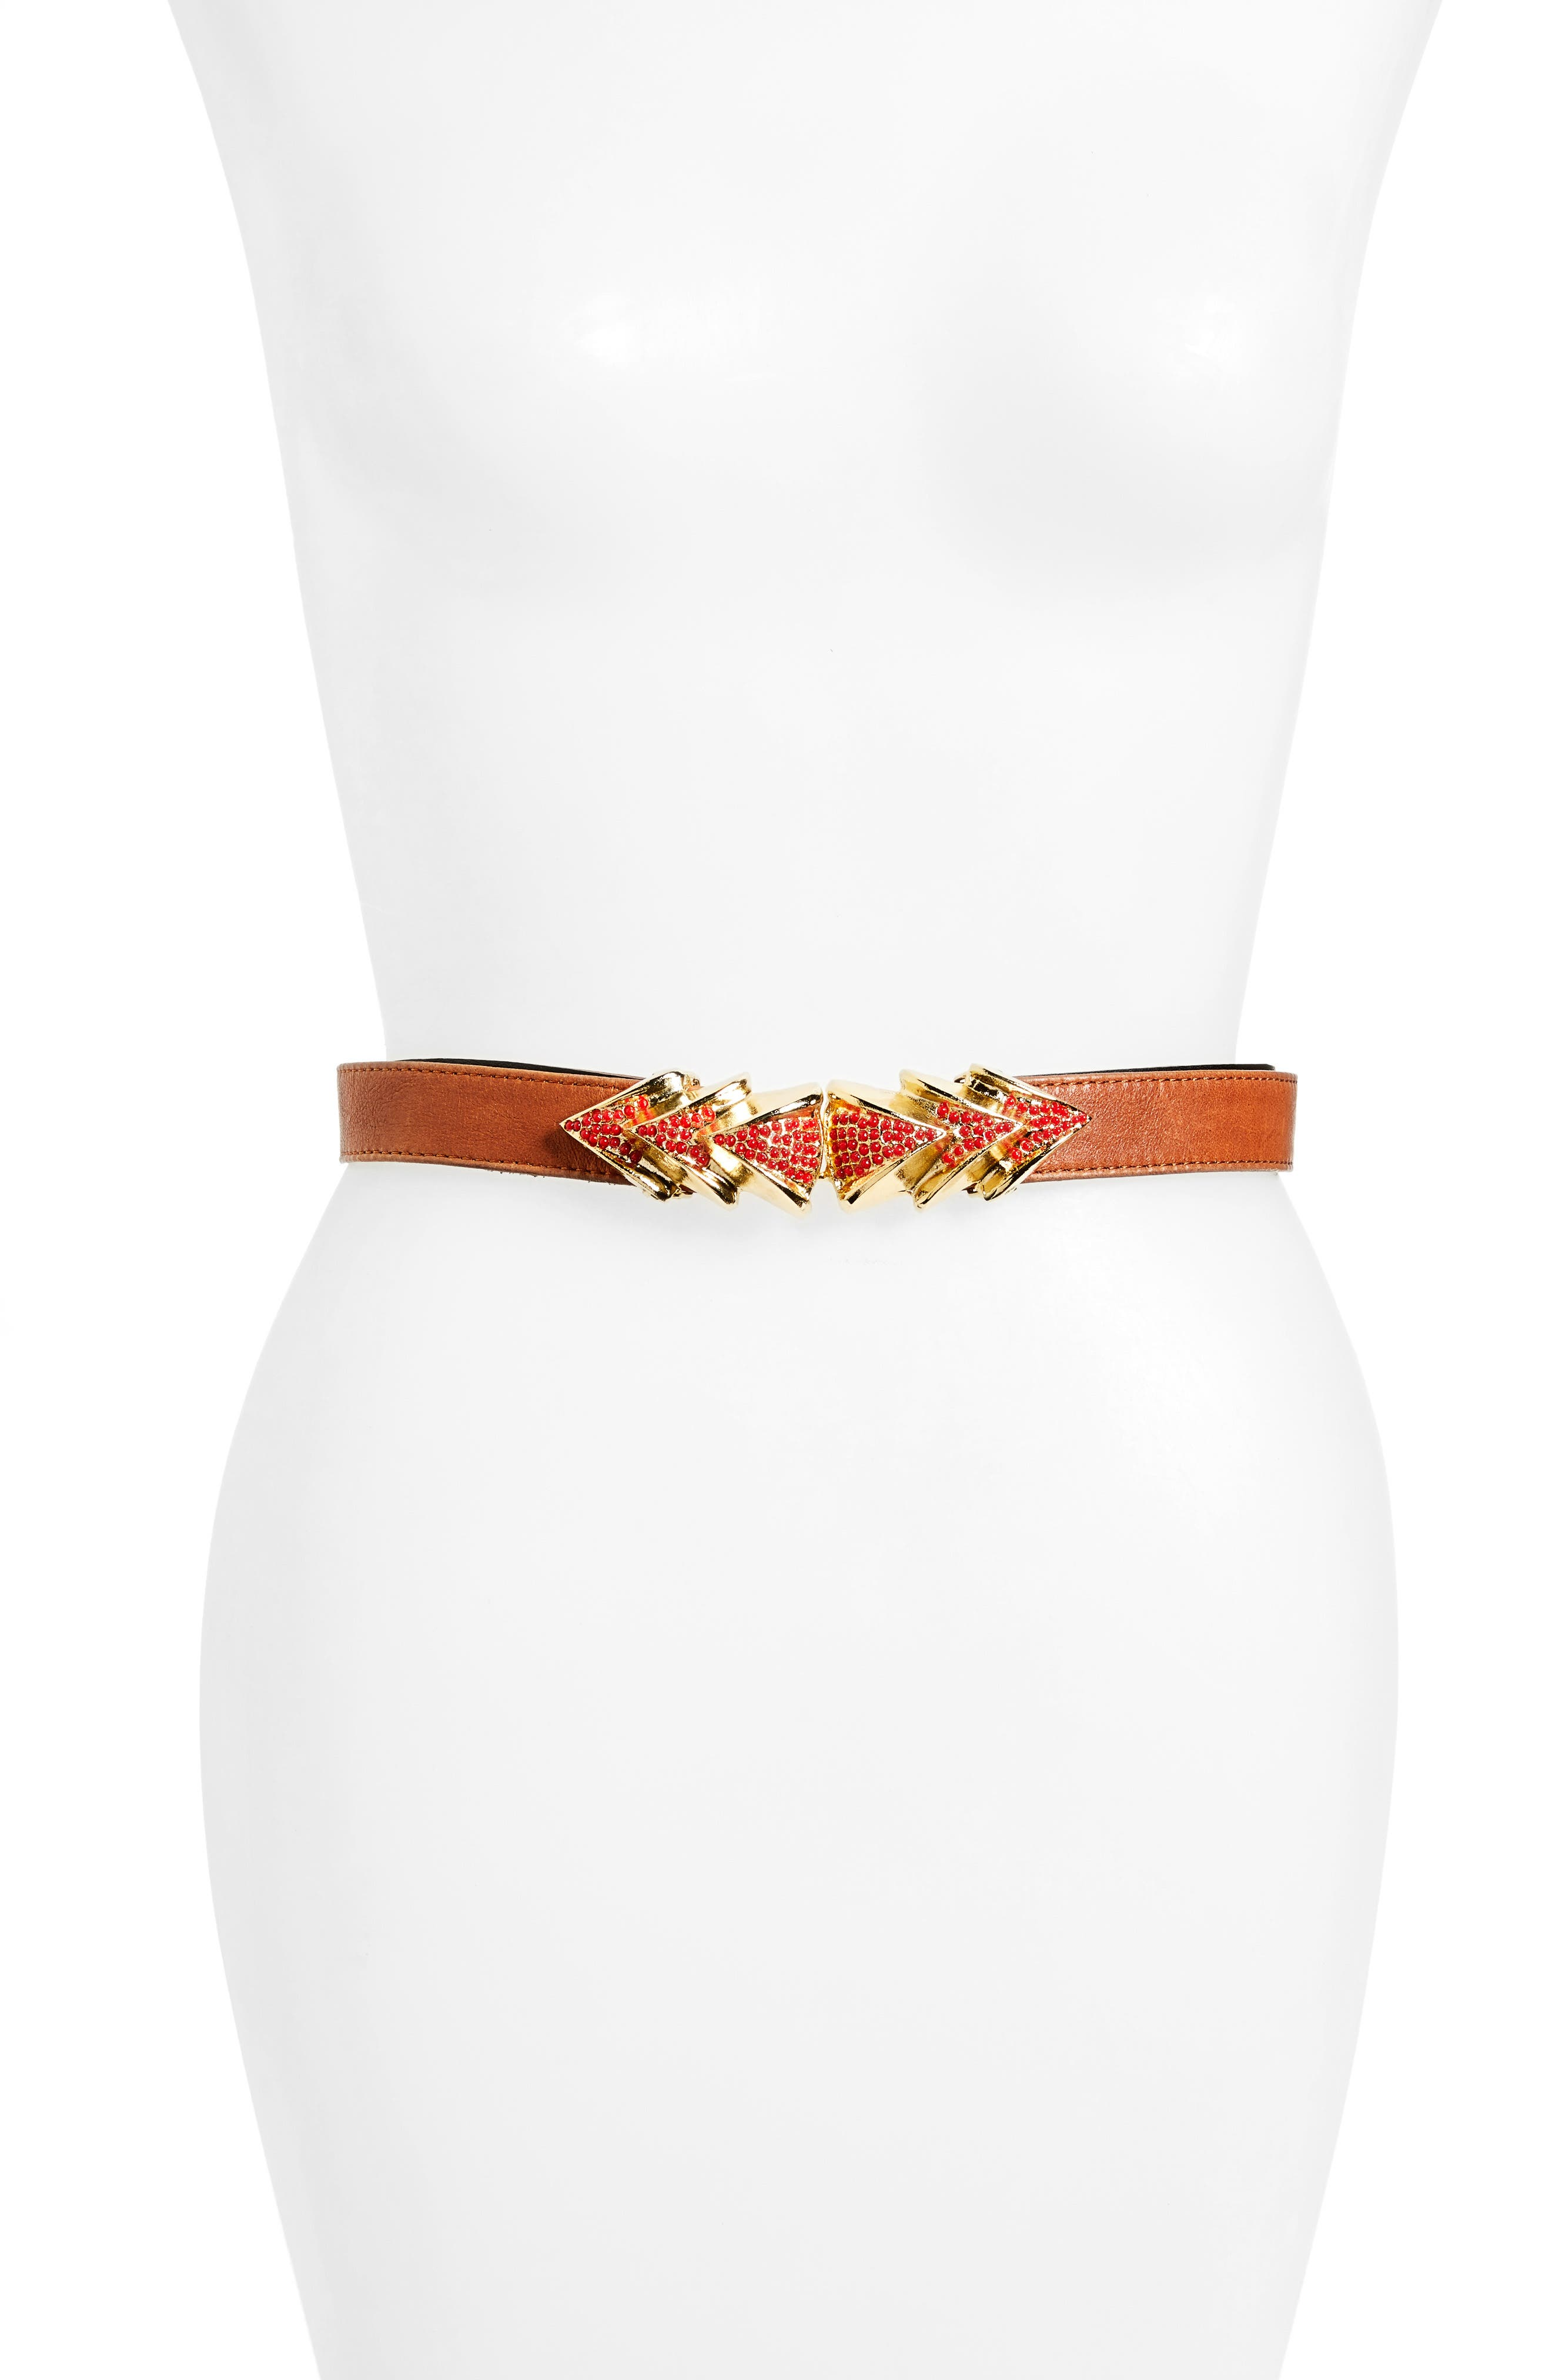 Raina Venice Leather Belt, Size One Size - Brown